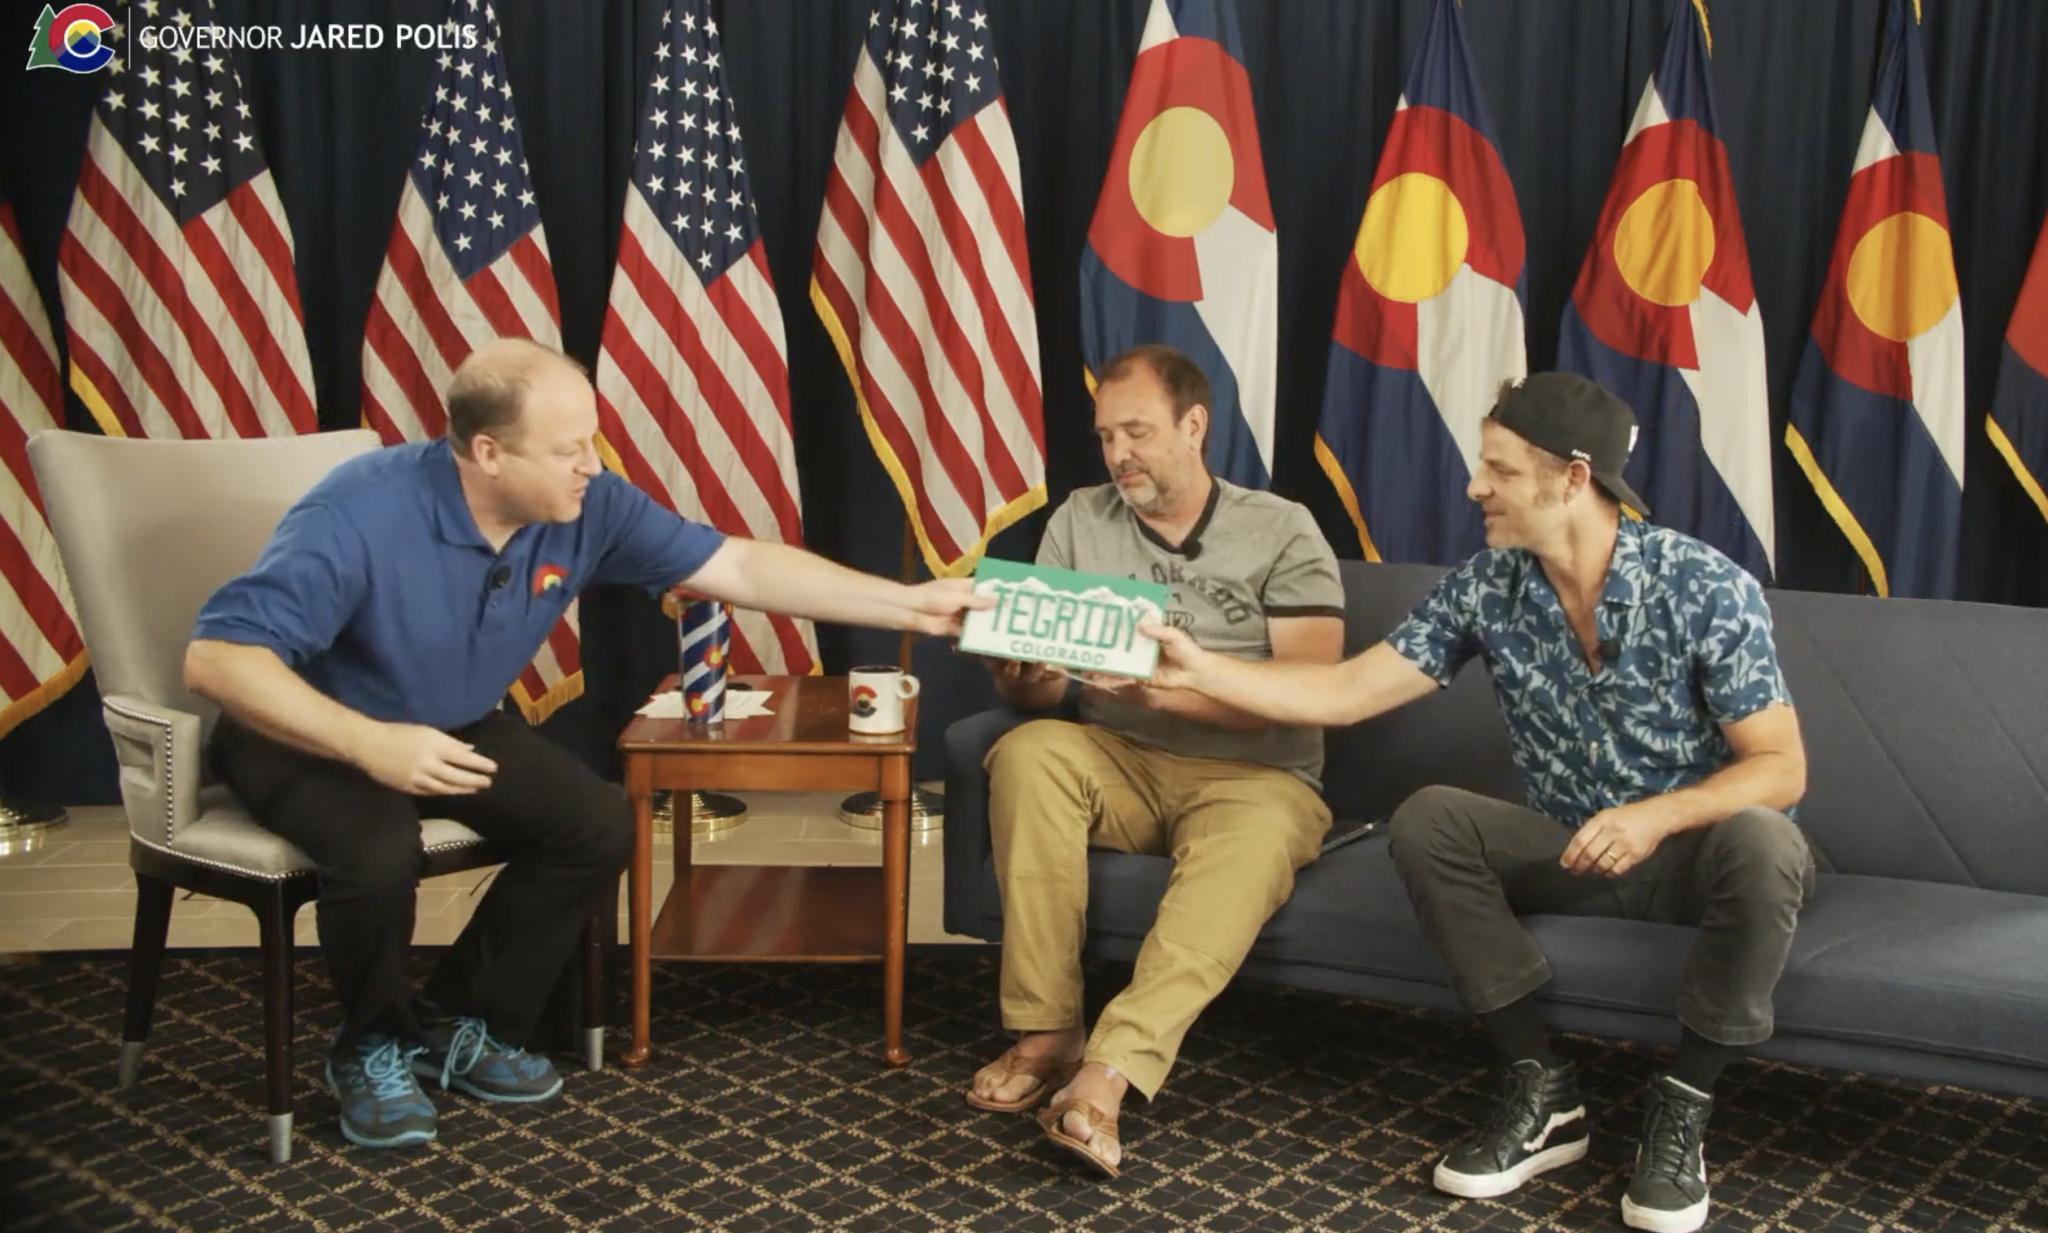 Colorado Governor Gives South Park Creators Marijuana-Themed License Plates Honoring 'Tegridy'